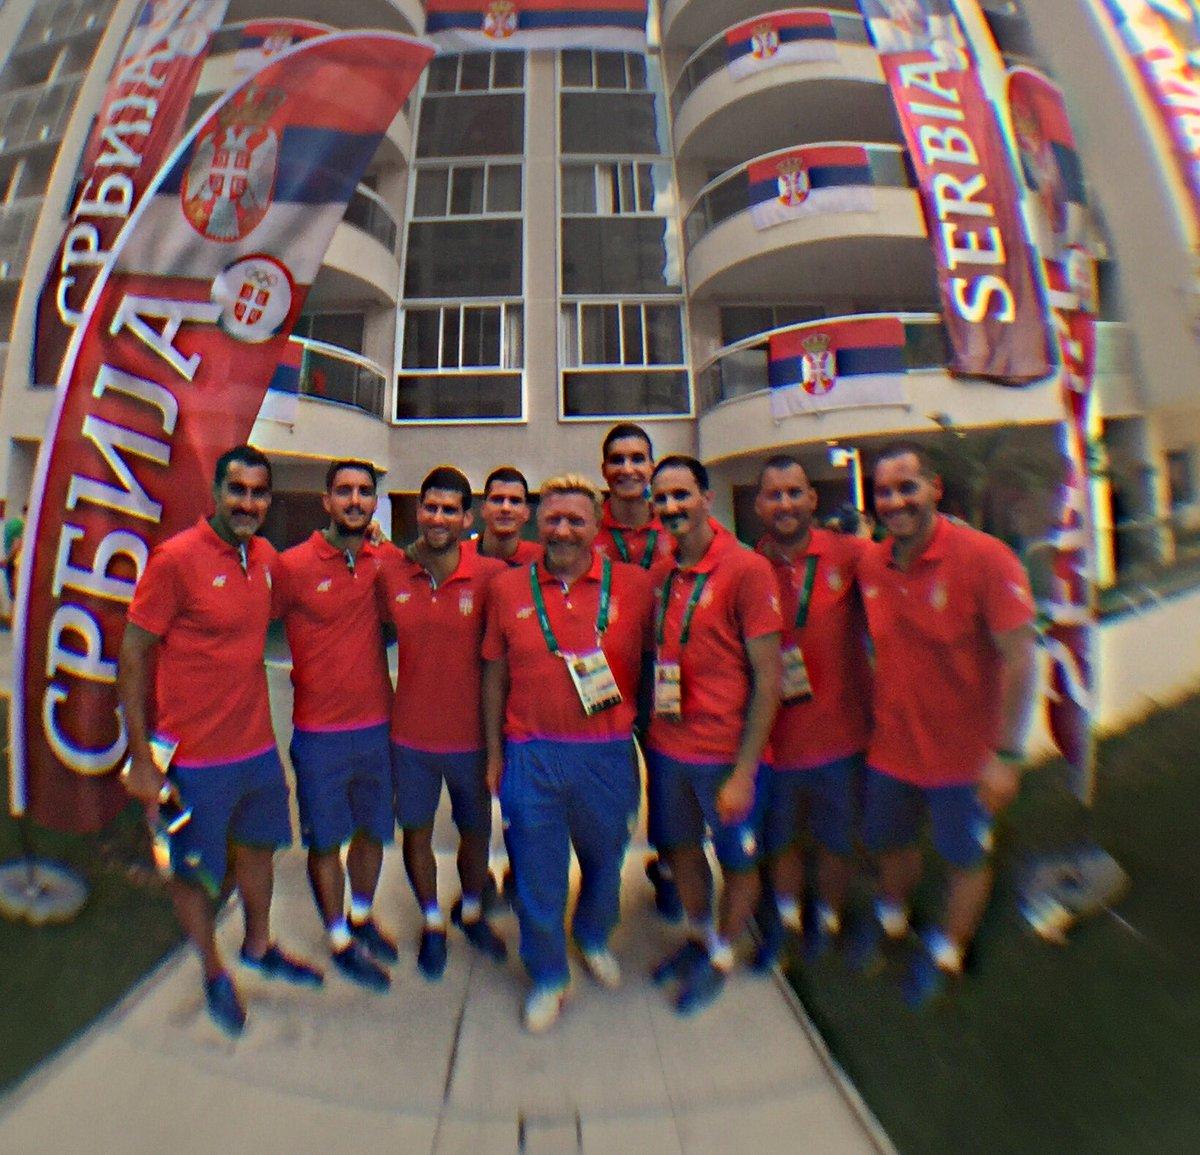 @DjokerNole @troicki_viktor @TheBorisBecker #TeamSerbia #tennis  2 guys from a different sport as well Who r they https://t.co/nxnfoWYw2W